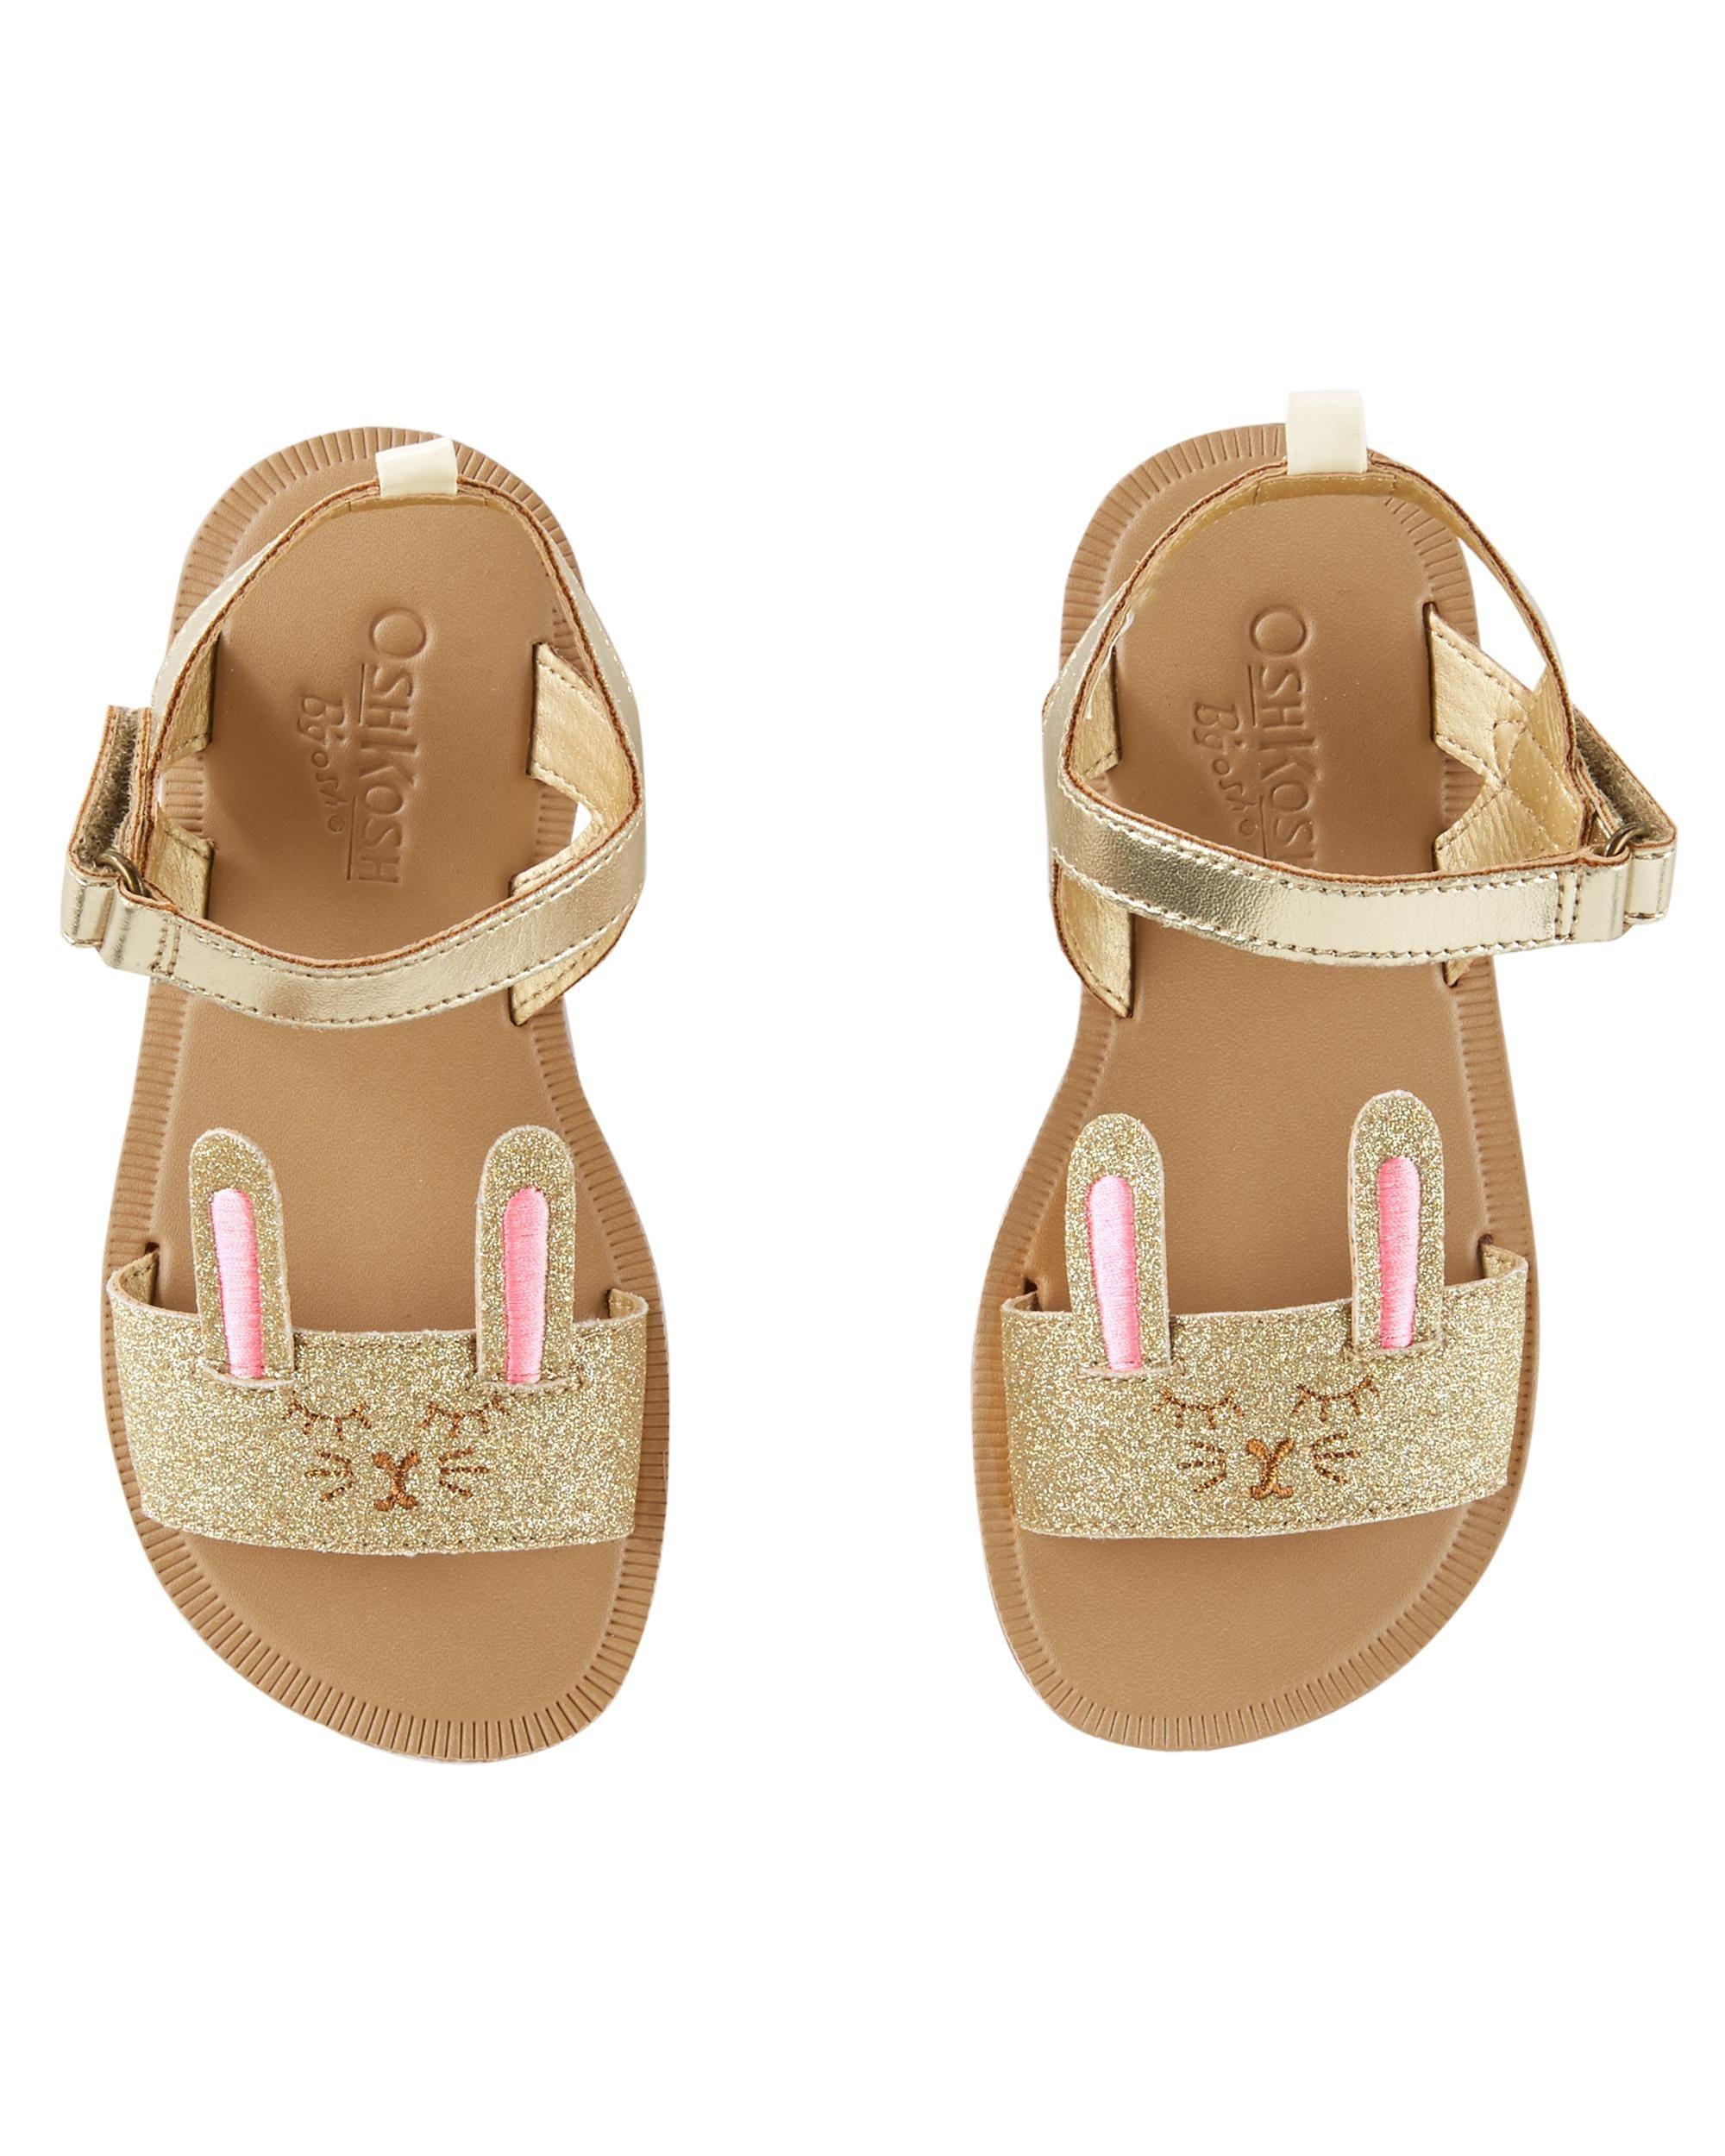 4238ee7e6 OshKosh Bunny Sandals